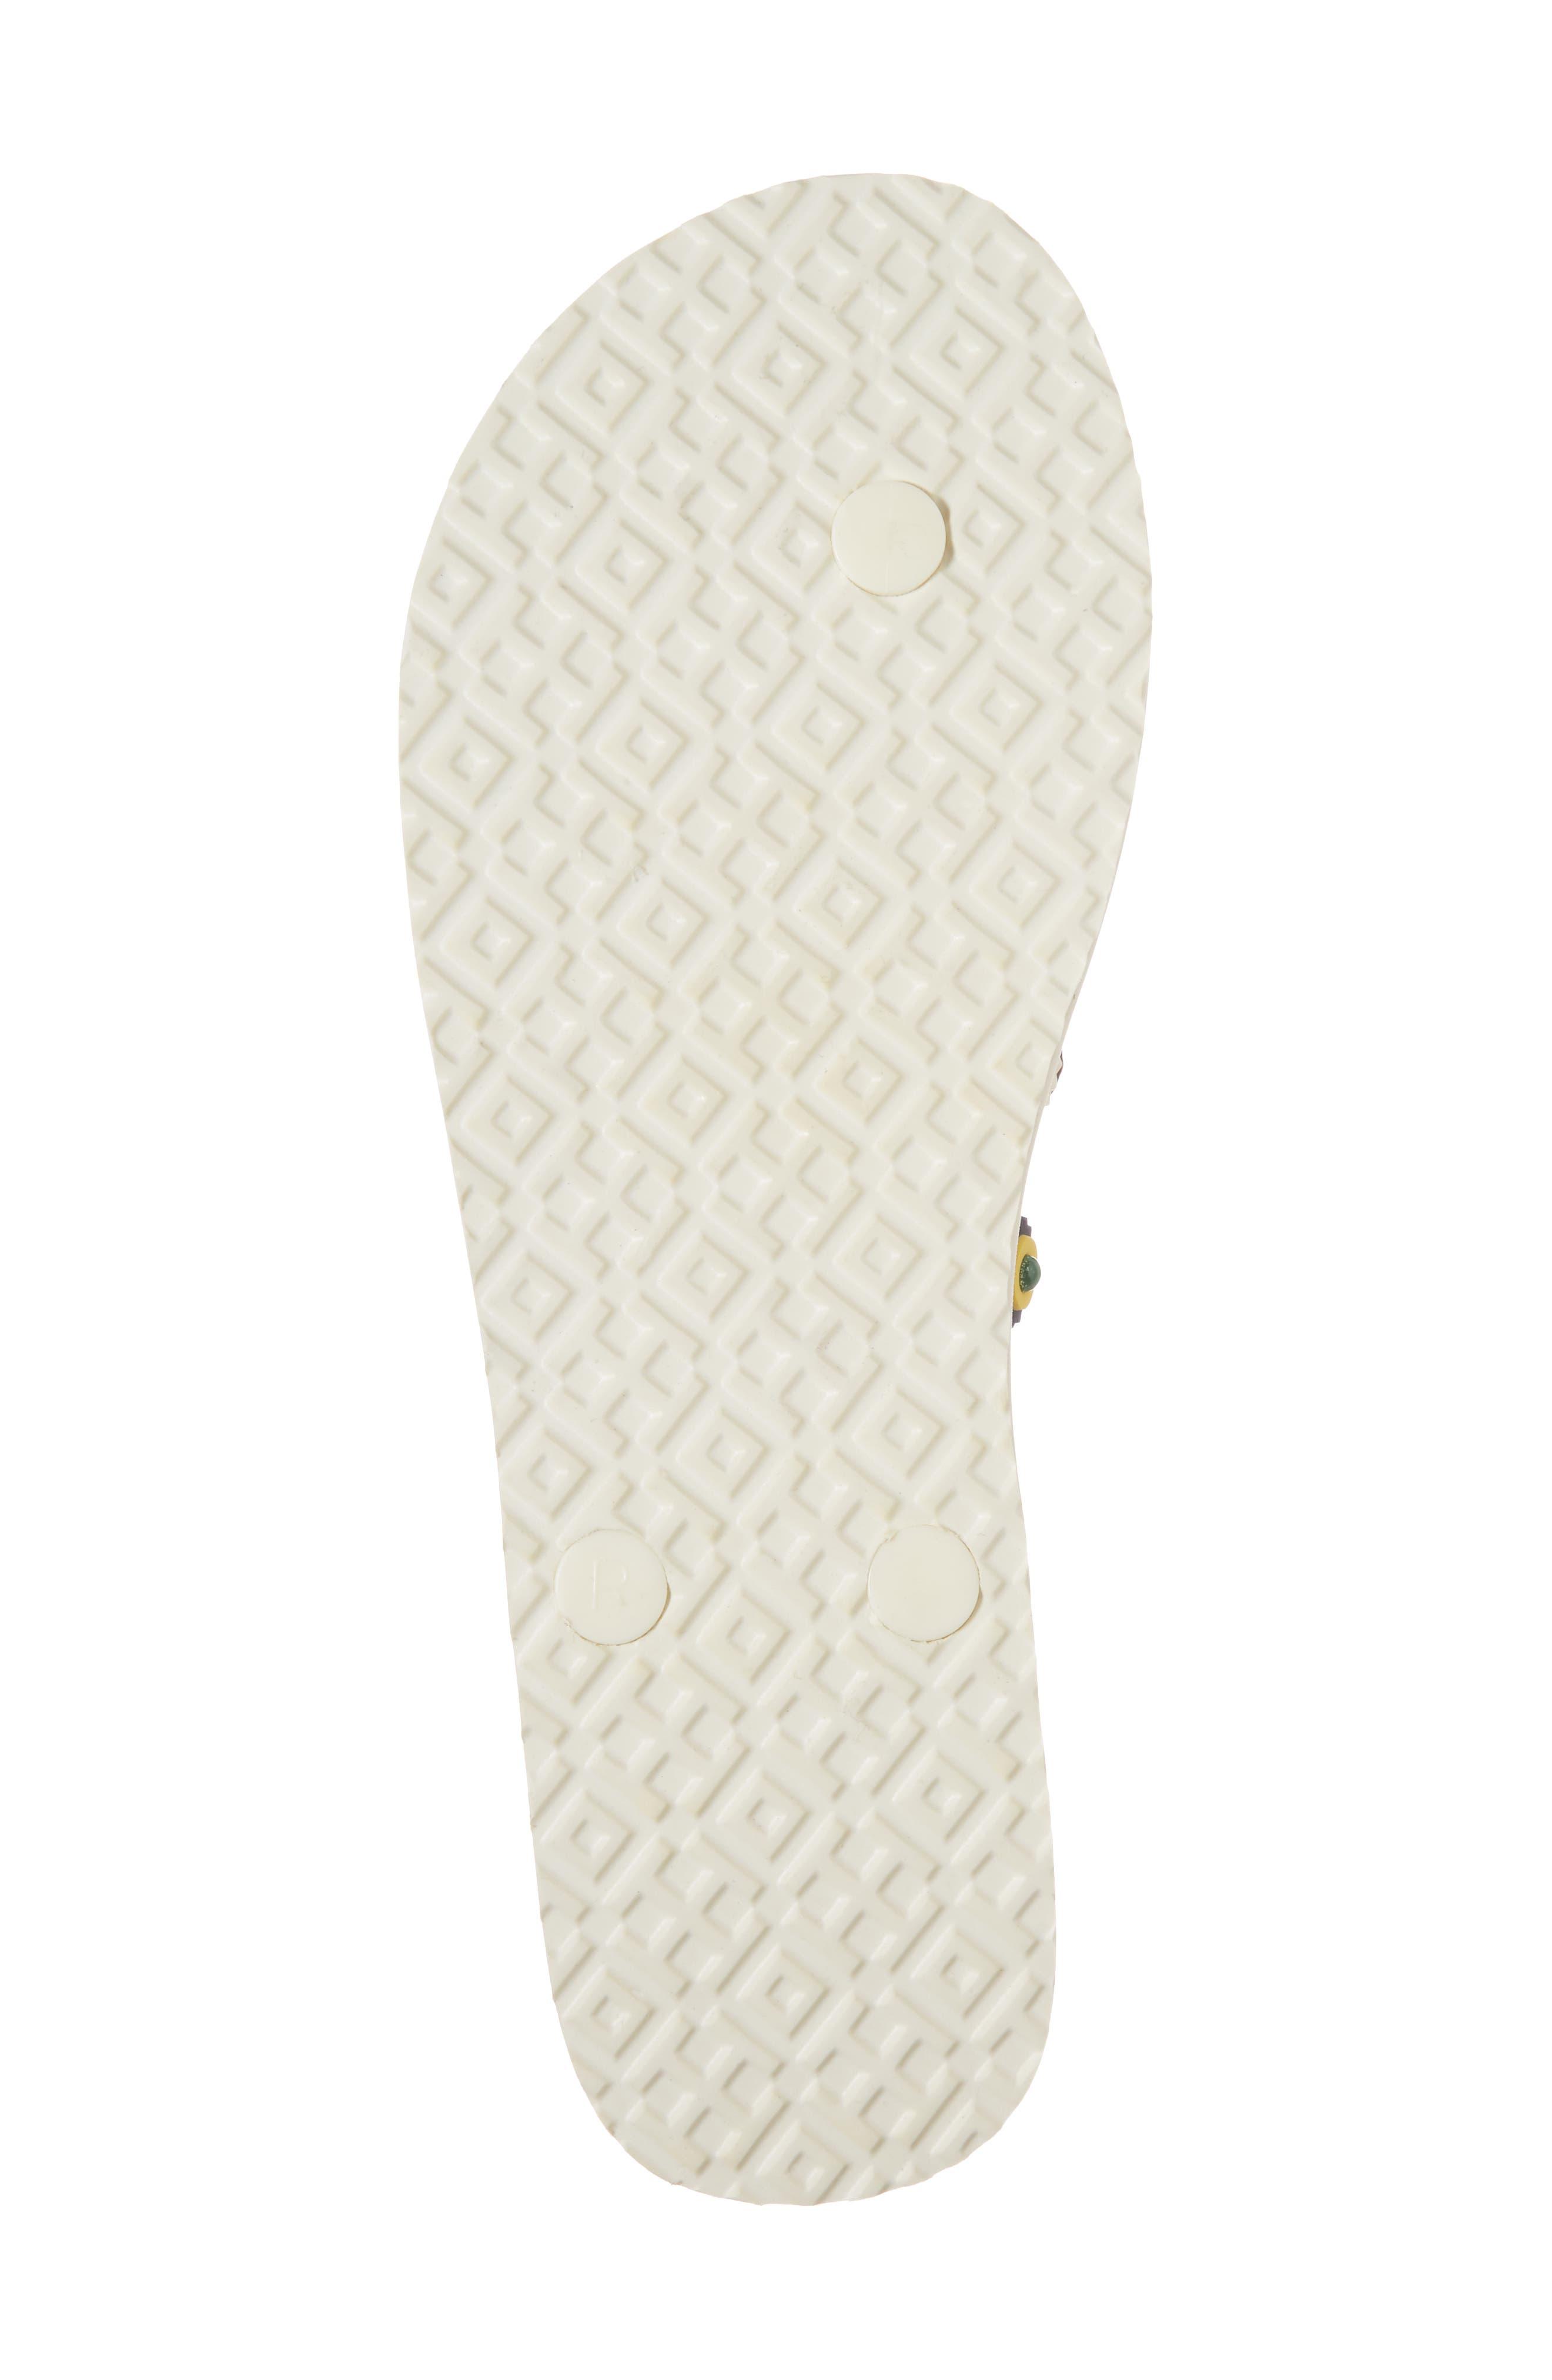 Marguerite 2 Studded Flip Flop,                             Alternate thumbnail 6, color,                             Perfect Ivory